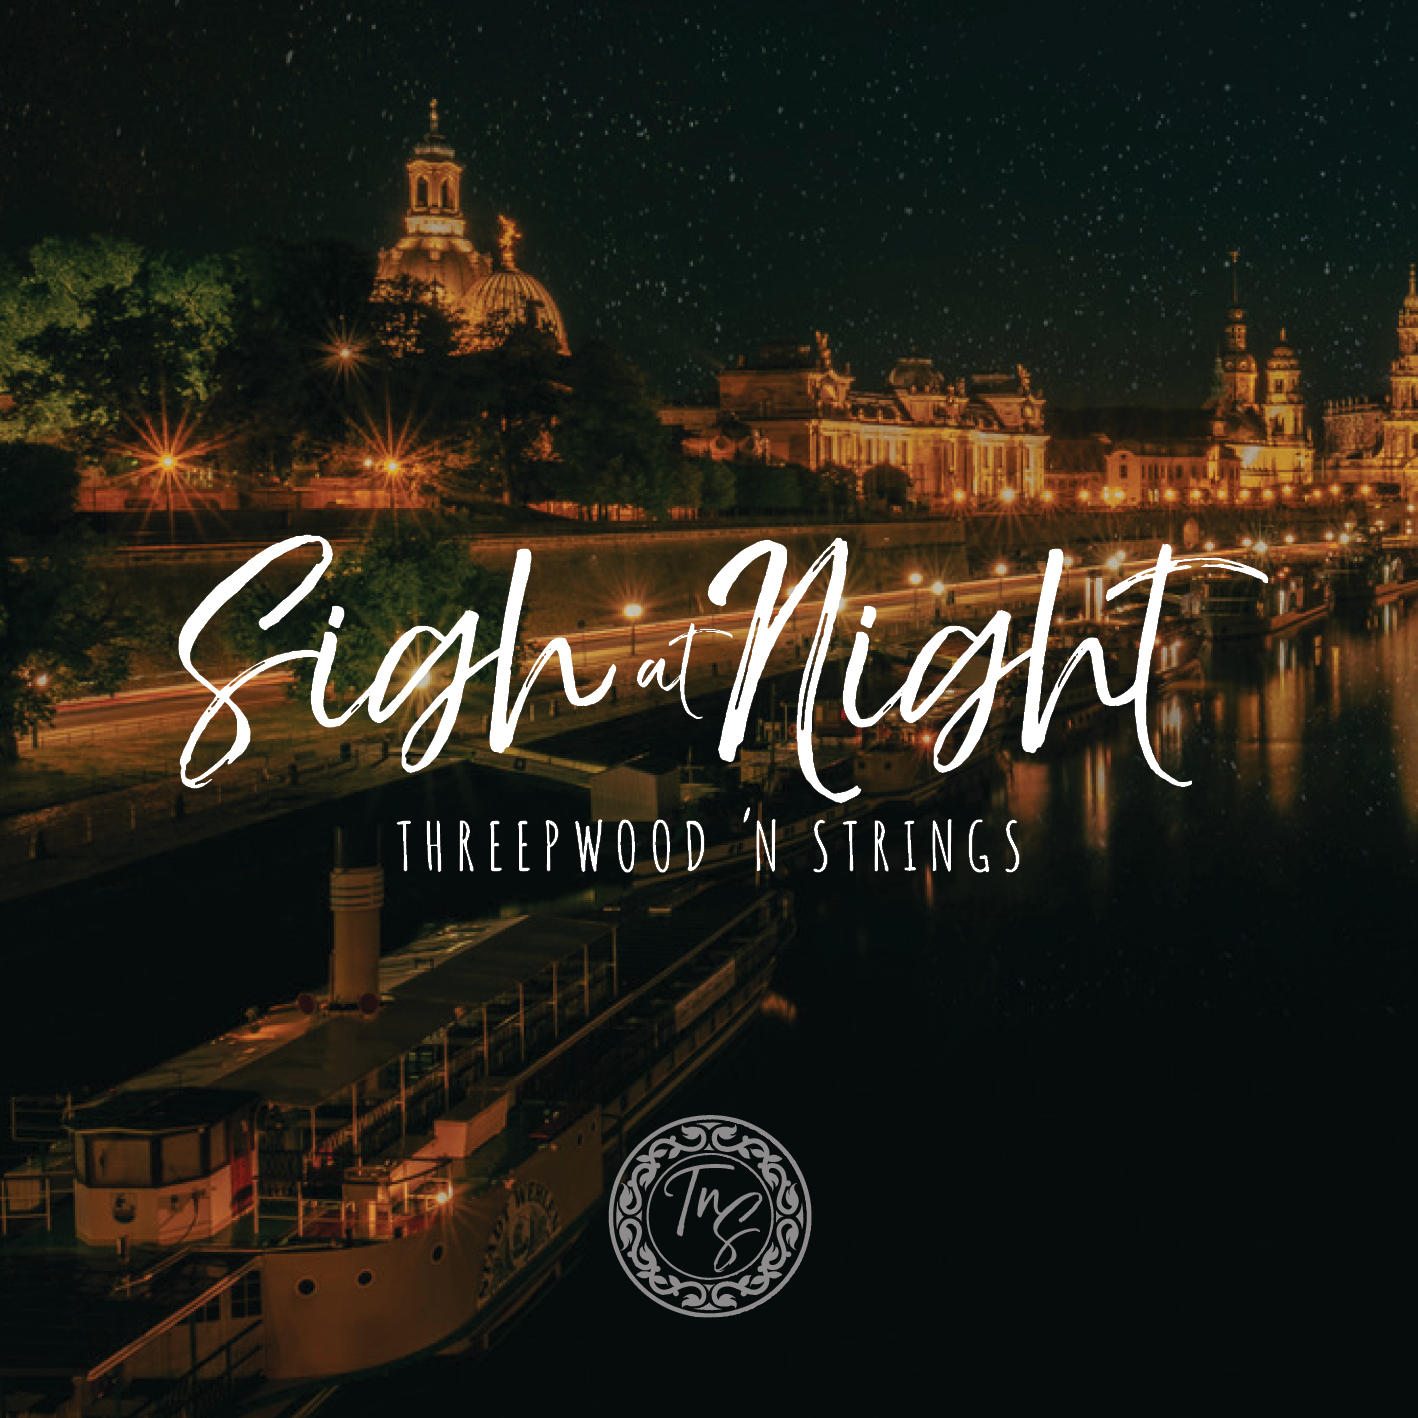 Threepwood N Strings_Sigh At Night_Cover